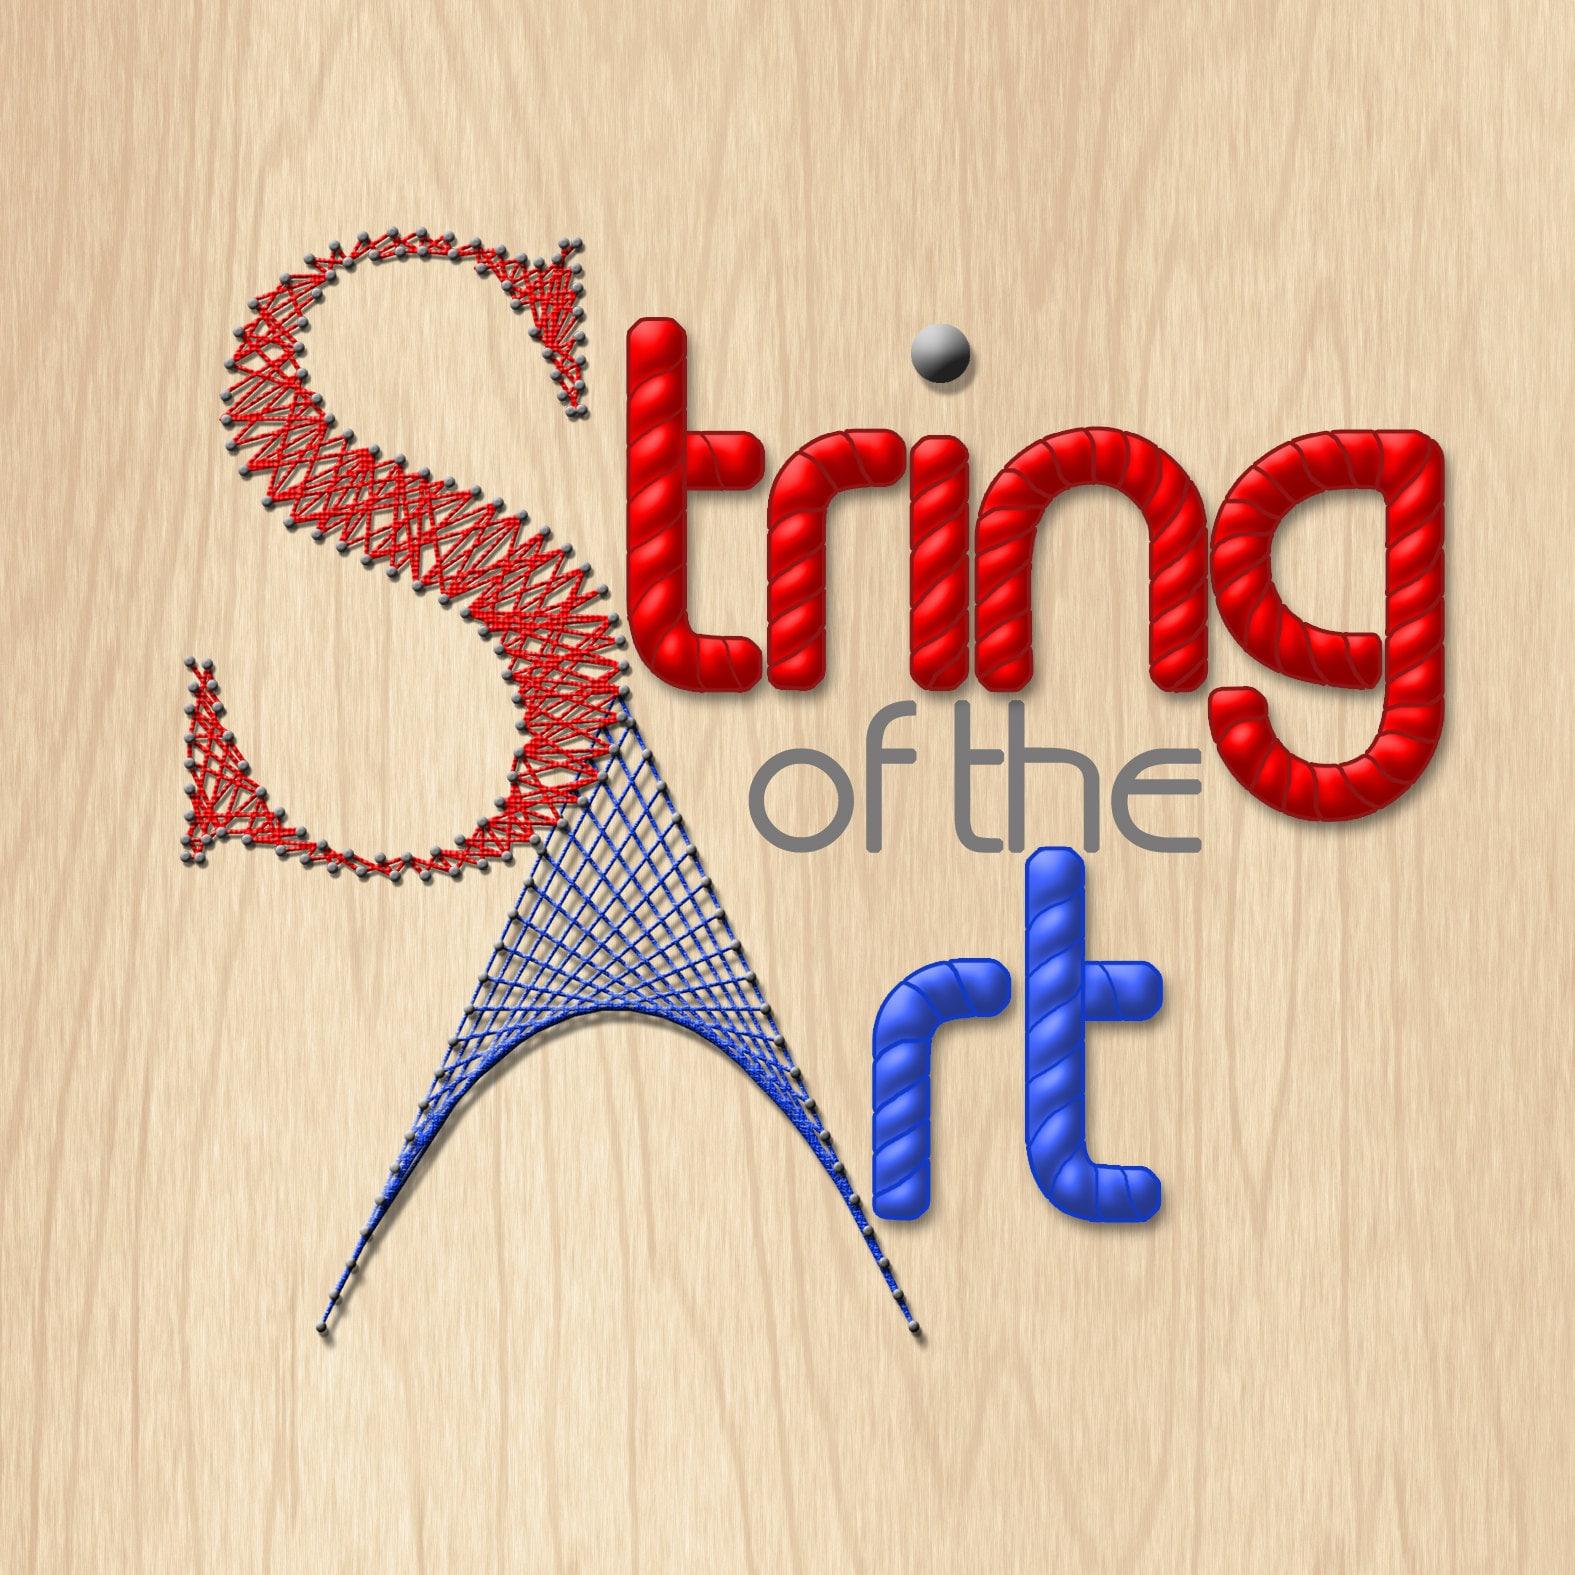 Fun And Beautiful Diy String Art Kits By Stringoftheart On Etsy